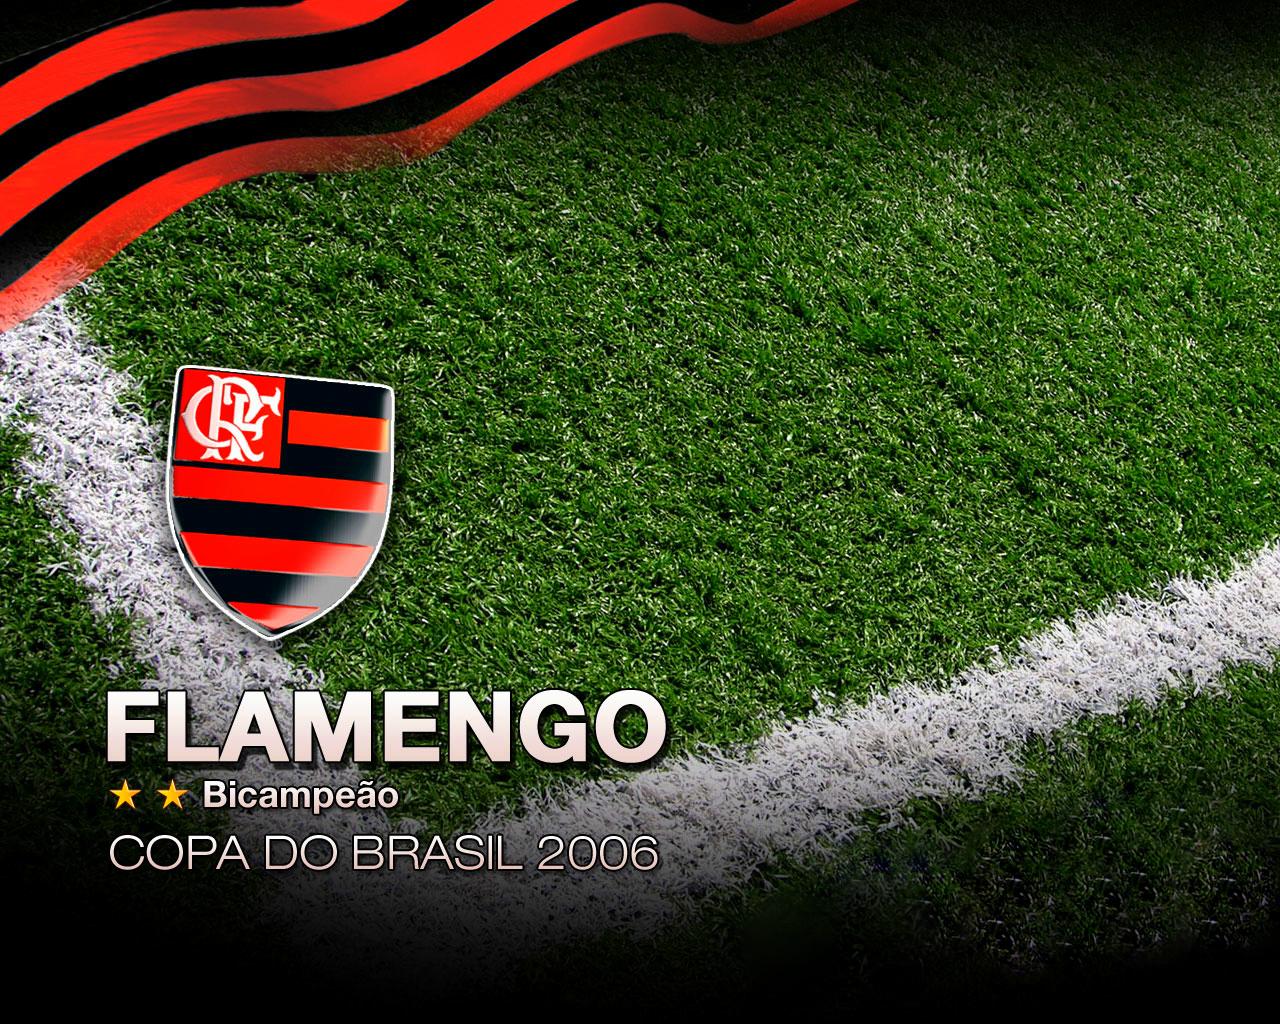 http://1.bp.blogspot.com/-6LT8Jrvq8Pc/UA10TmTyDeI/AAAAAAAAAtg/CyQ8d0VT-Mk/s1600/flamengo-campeao-wallpaper+(7).jpg